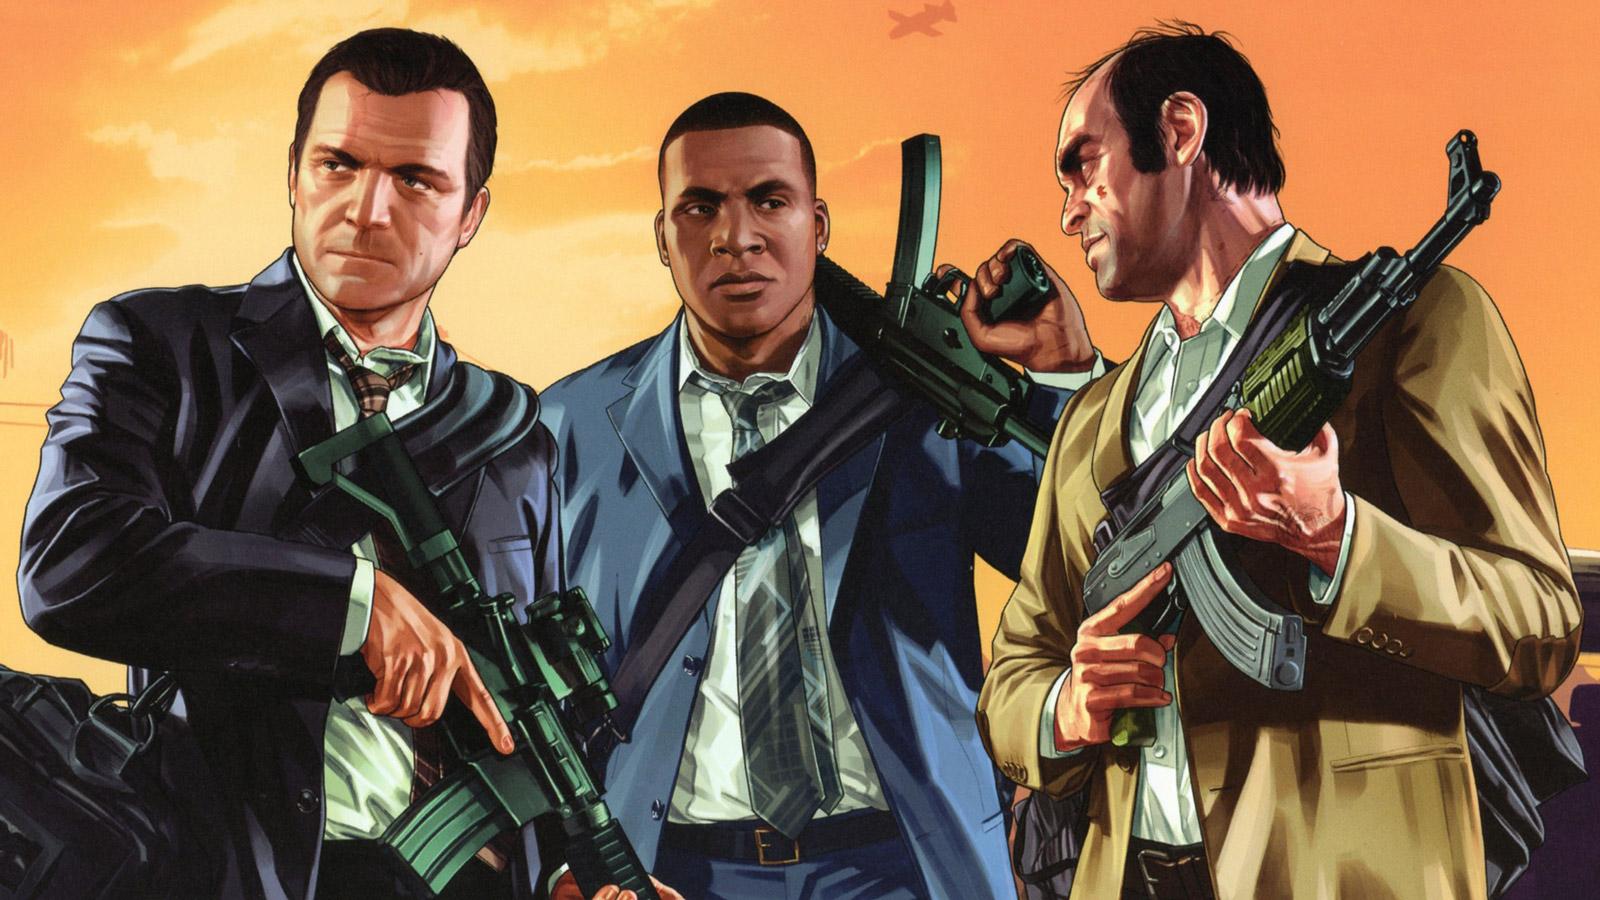 Free Grand Theft Auto V Wallpaper in 1600x900